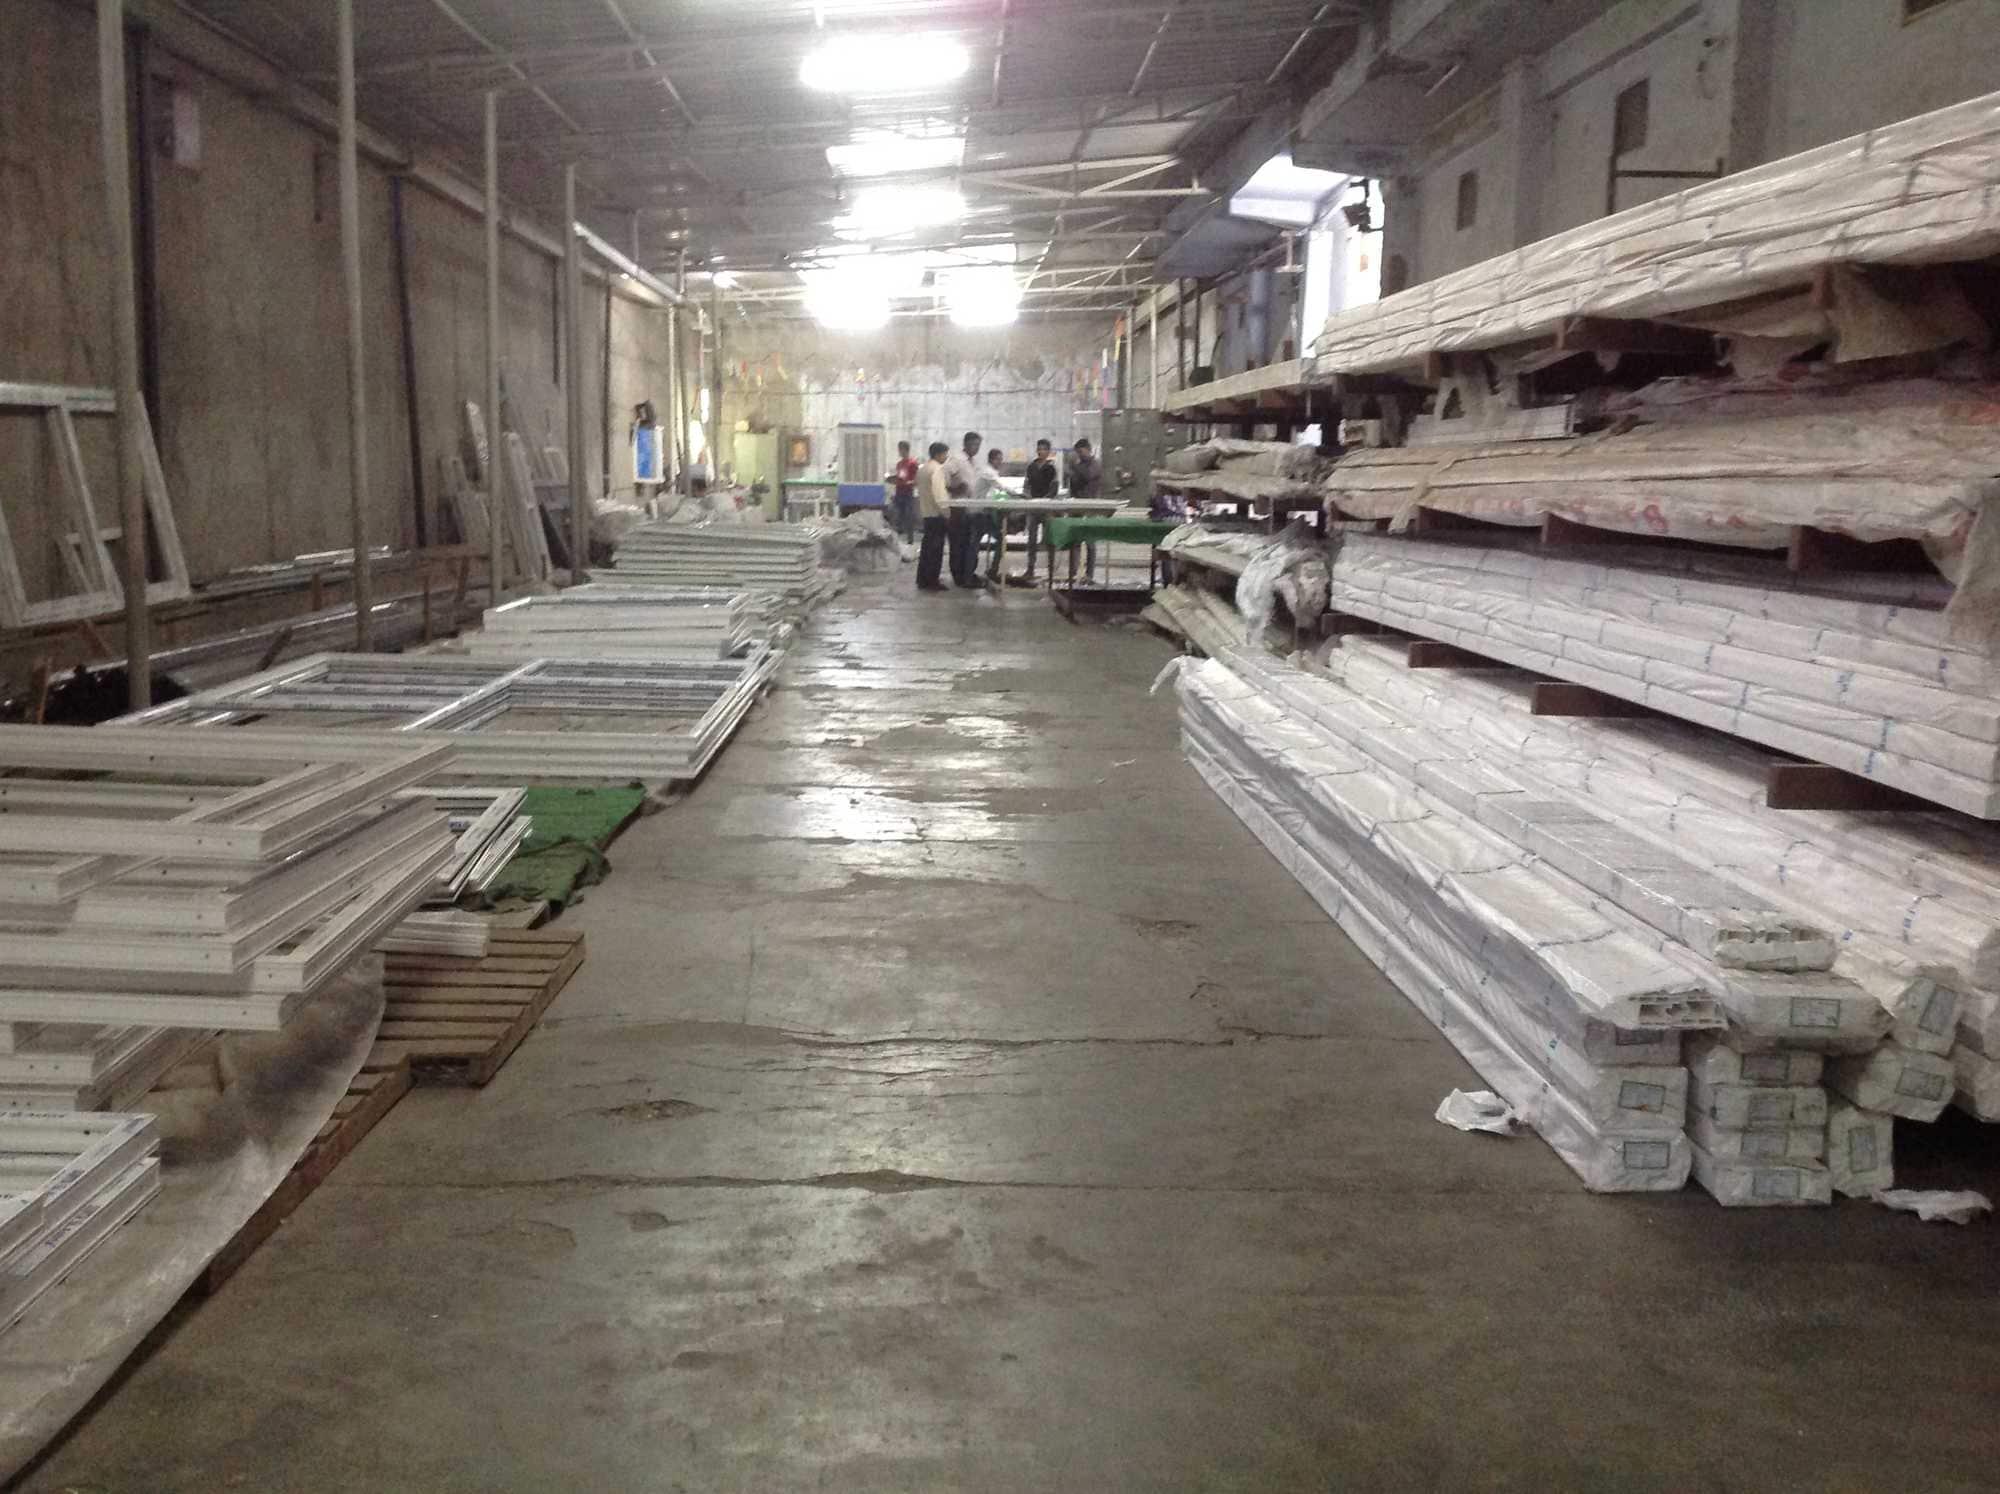 Garden furniture distributors in jhotwara industrial area jaipur